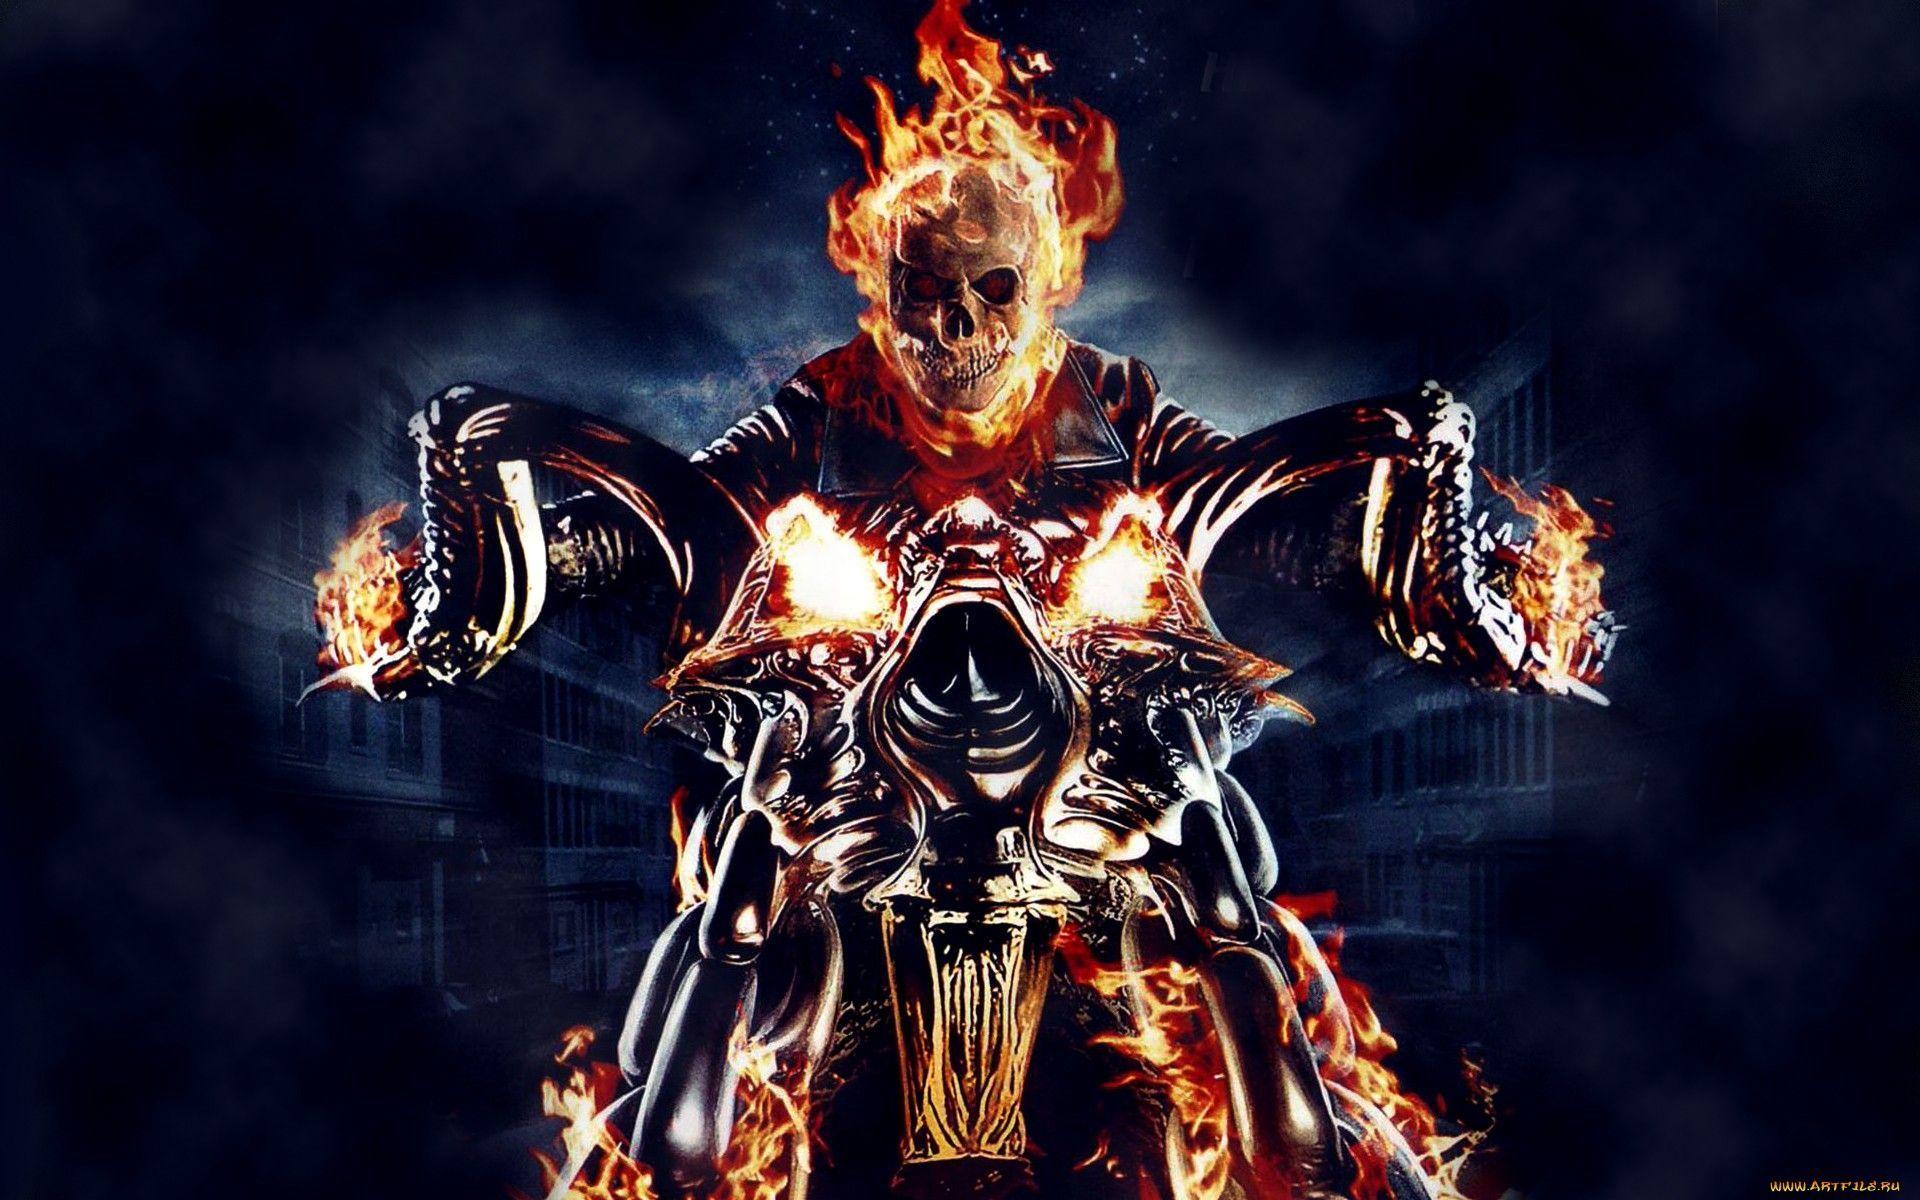 Beautiful Wallpaper Horse Ghost Rider - ab505fec298cb2da9635a6edac19d636  Pic_672210.jpg